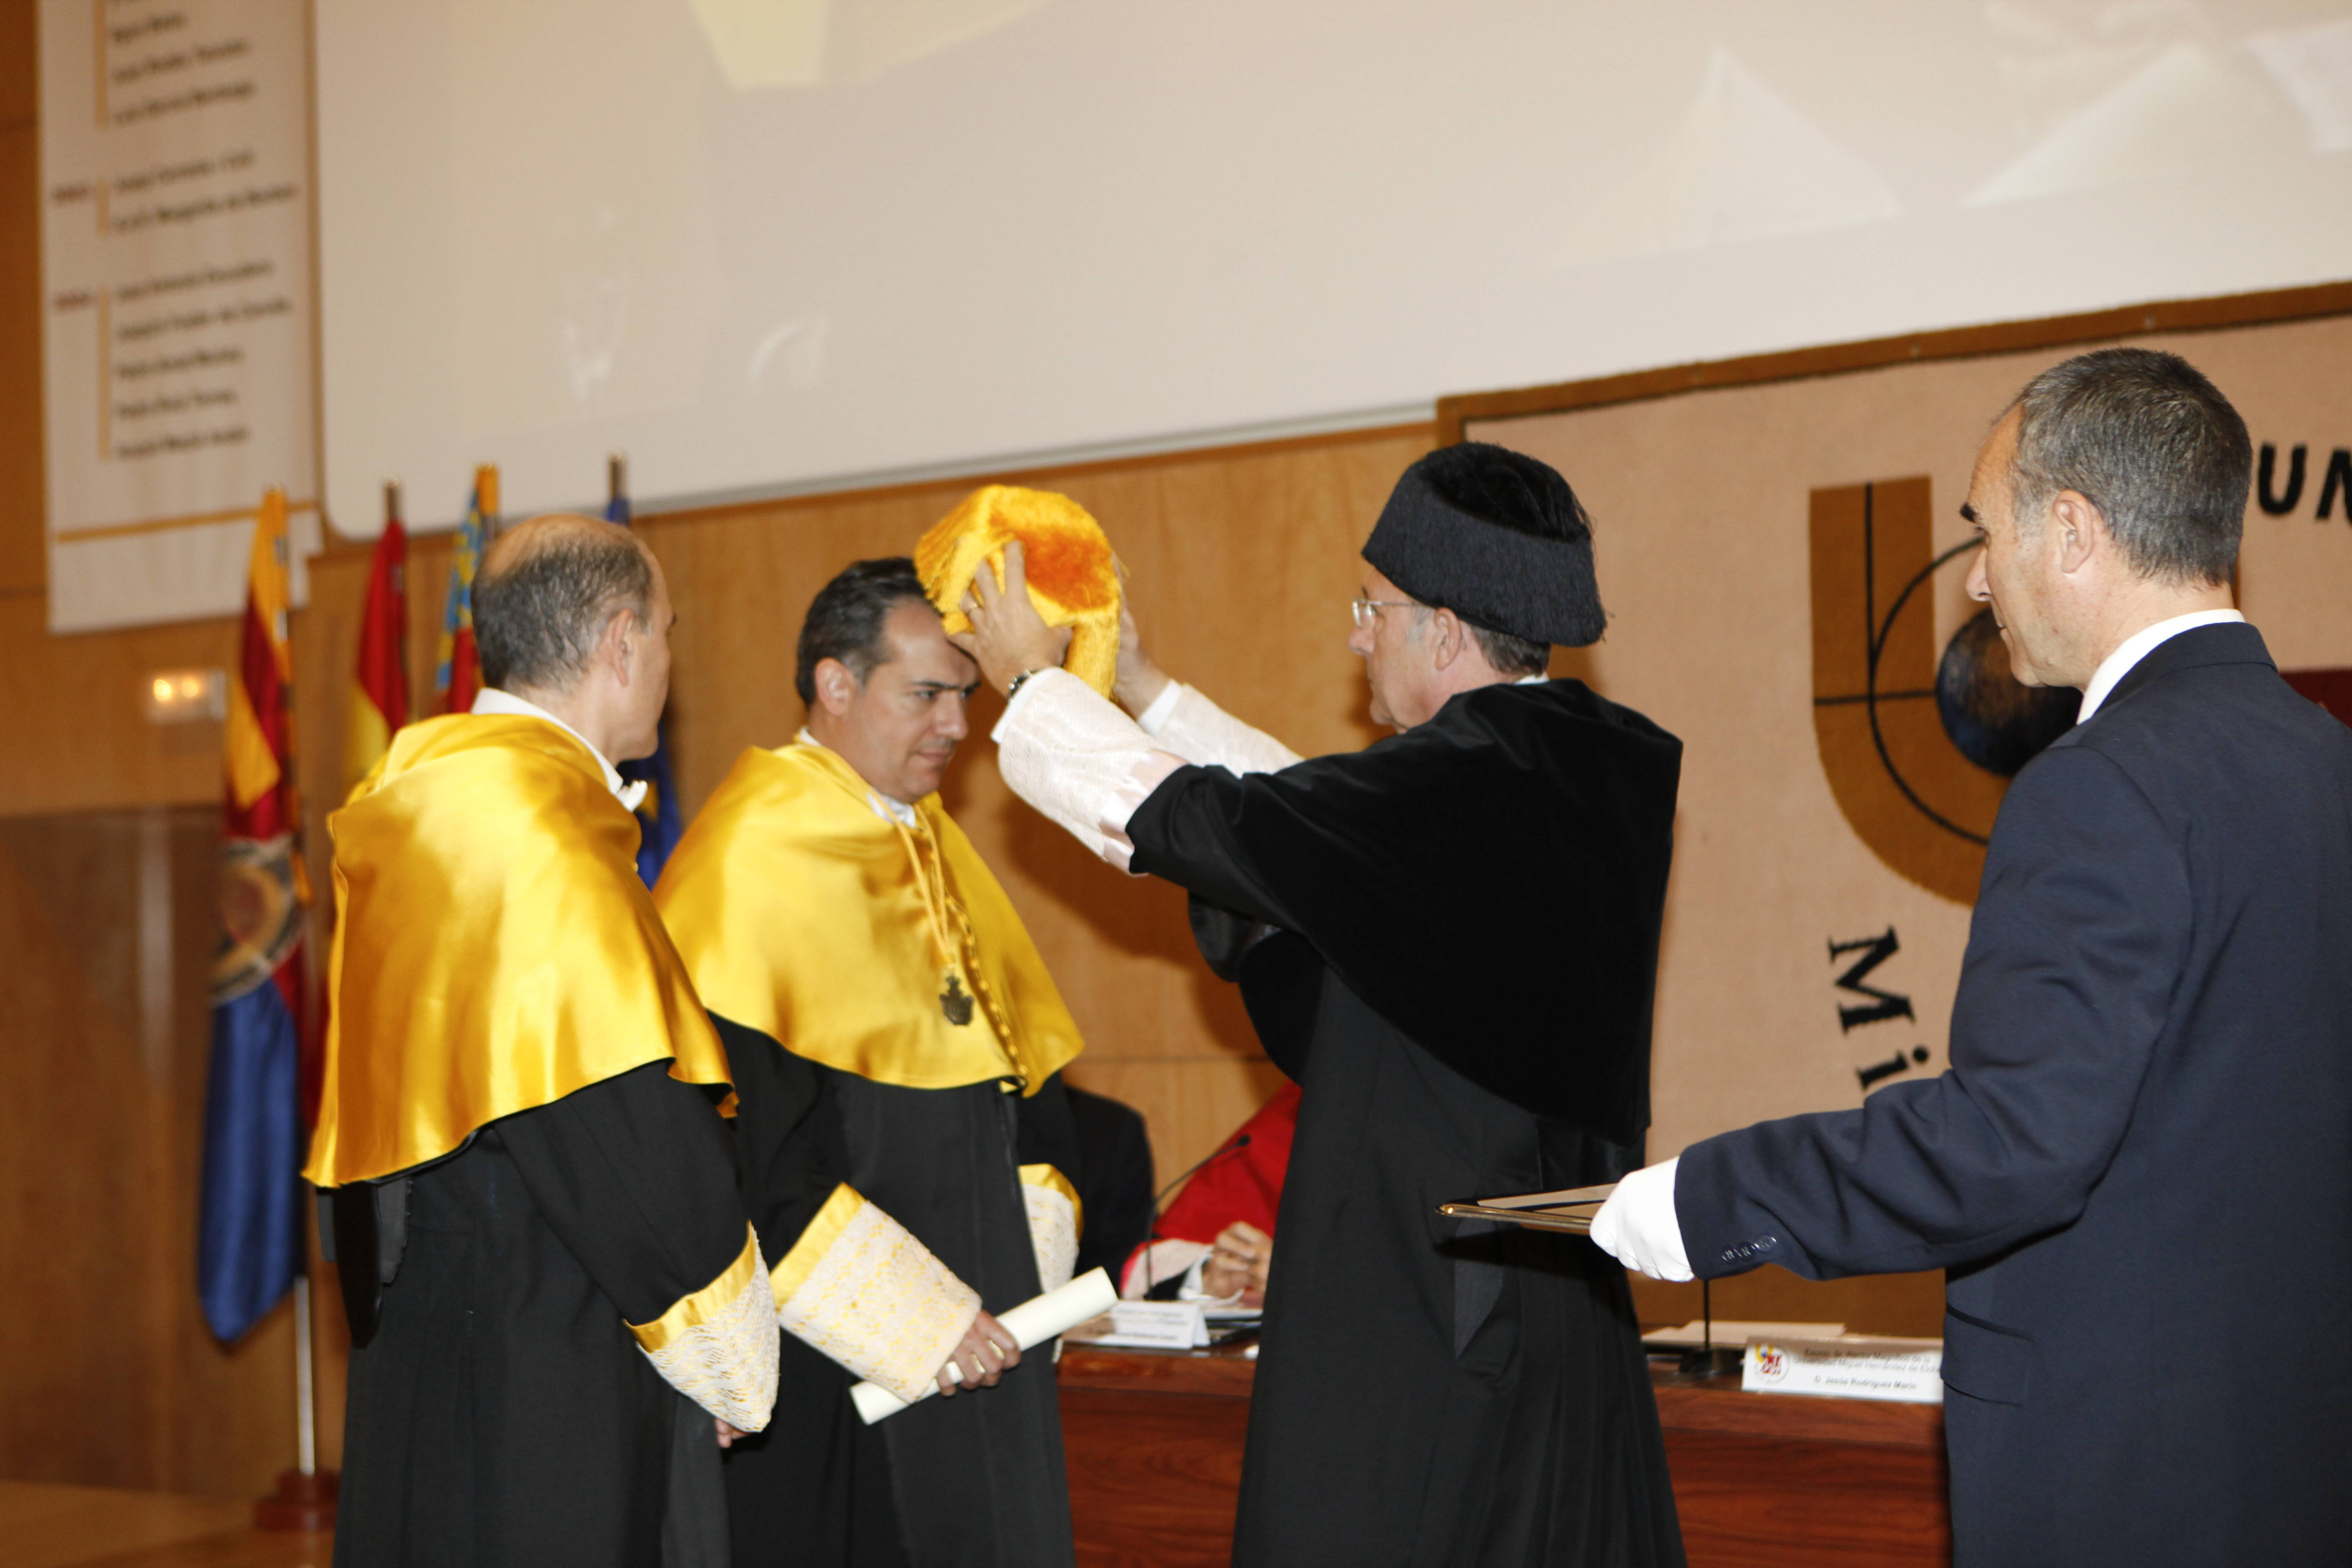 doctor-honoris-causa-luis-gamir_mg_1107.jpg